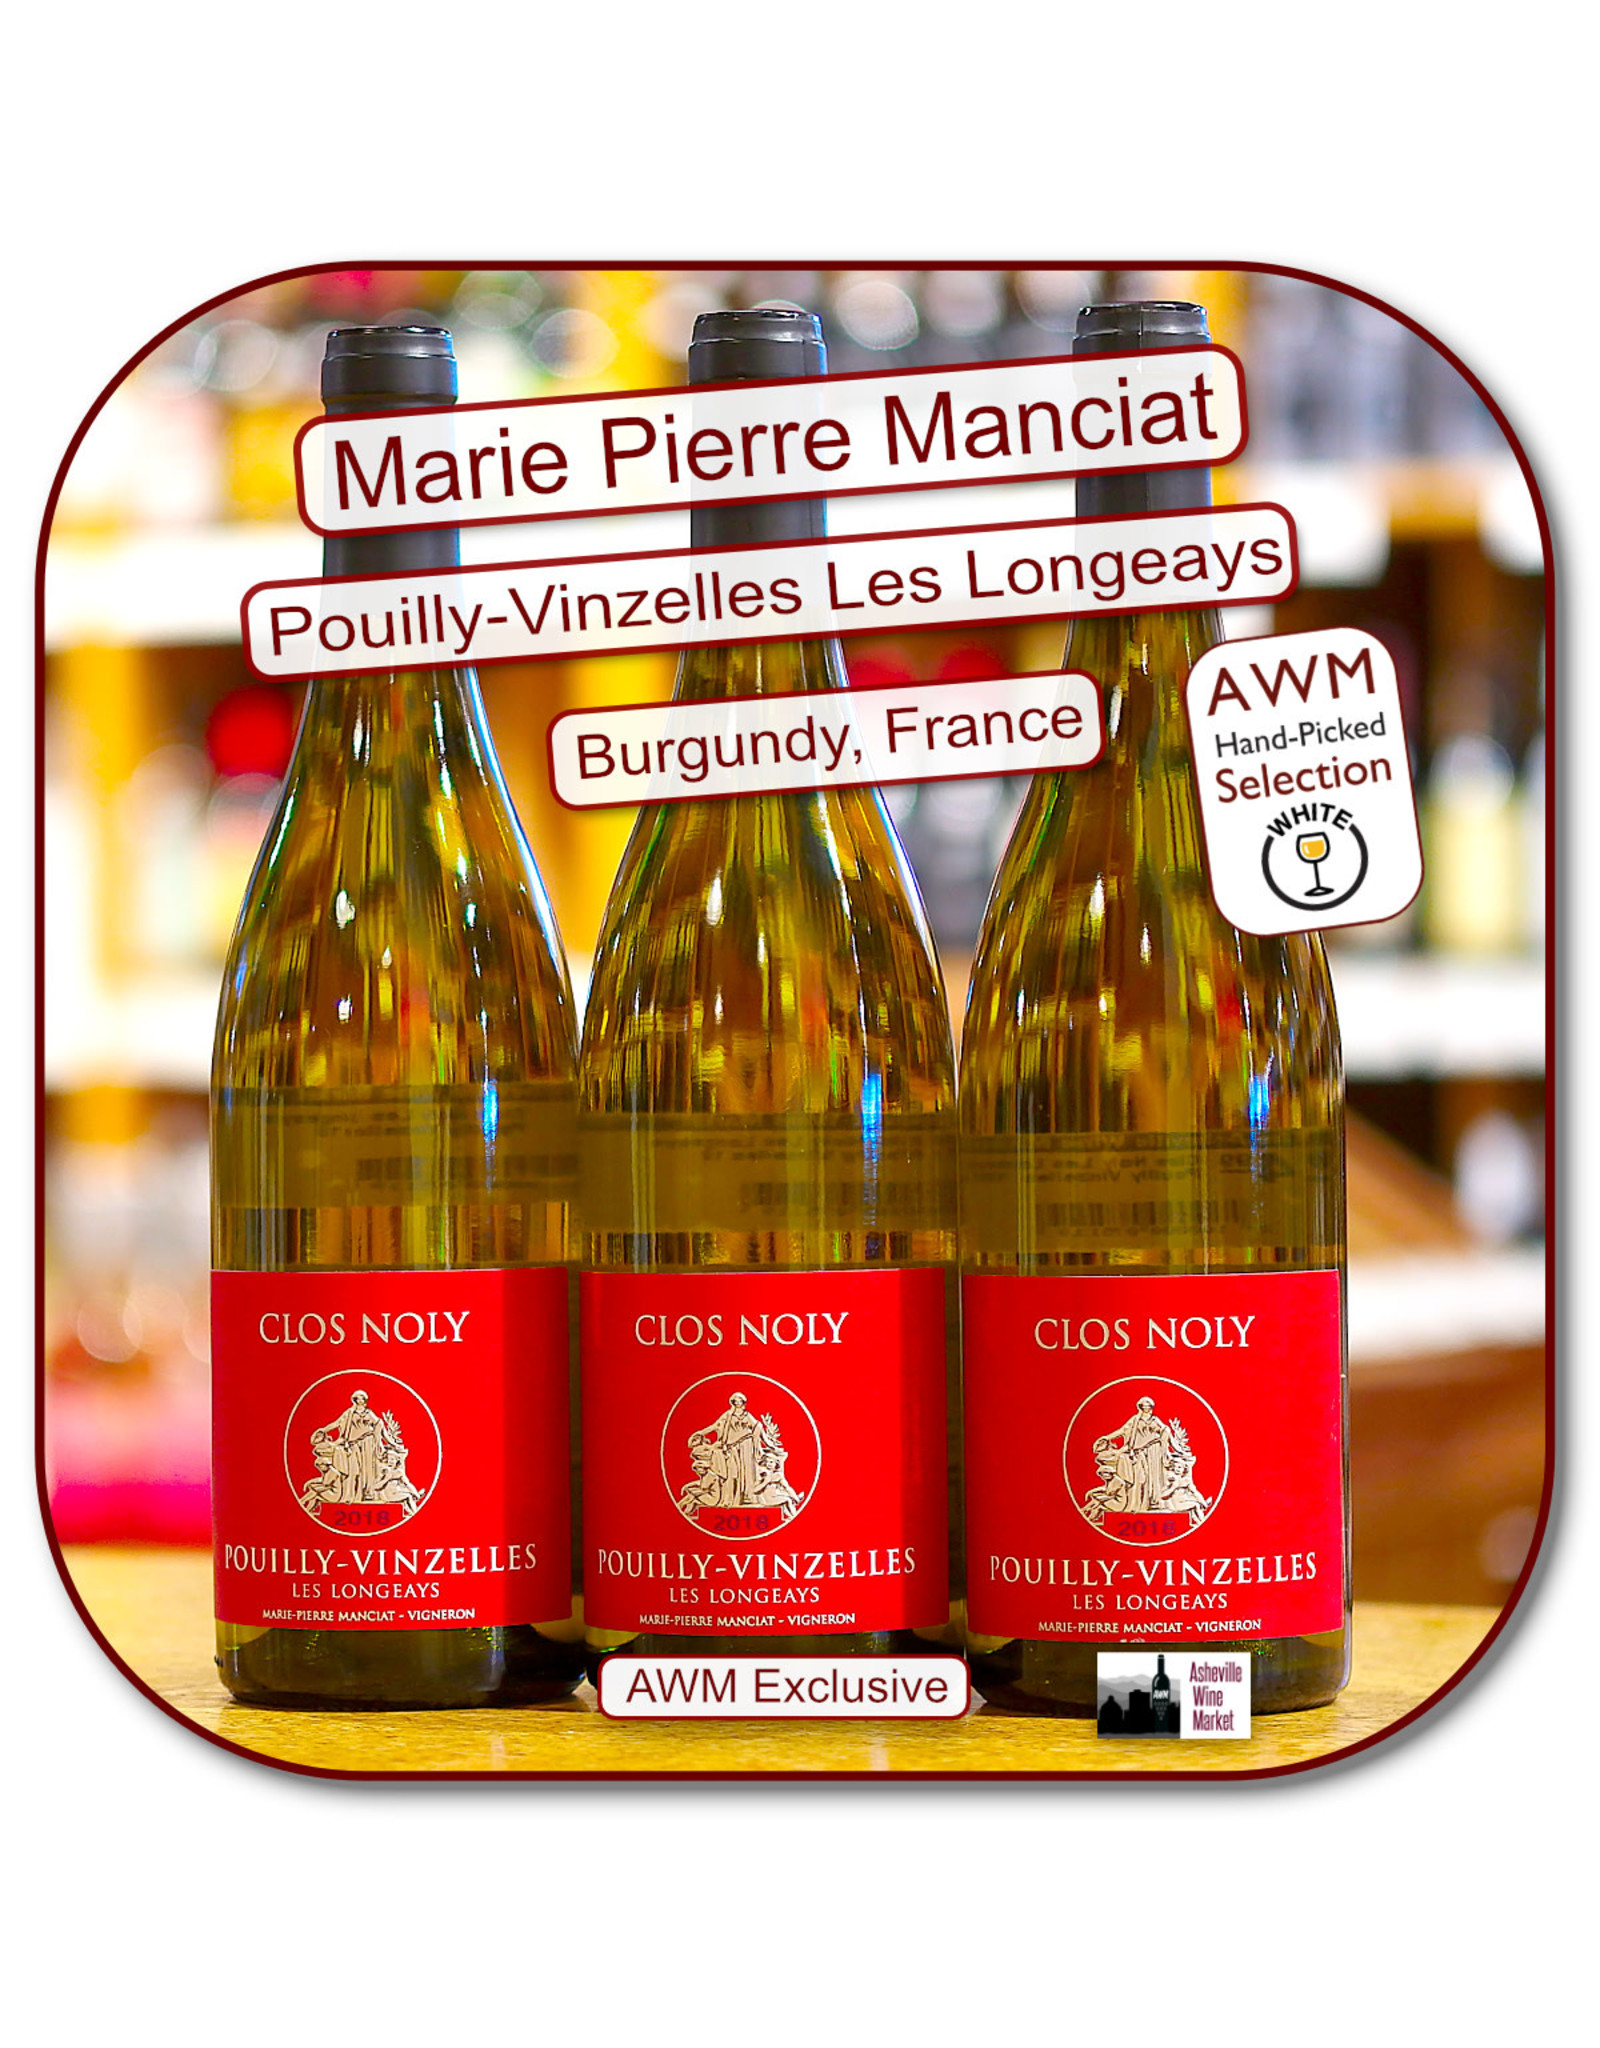 Chardonnay Clos Noly Les Longeays Pouilly Vinzelles 18